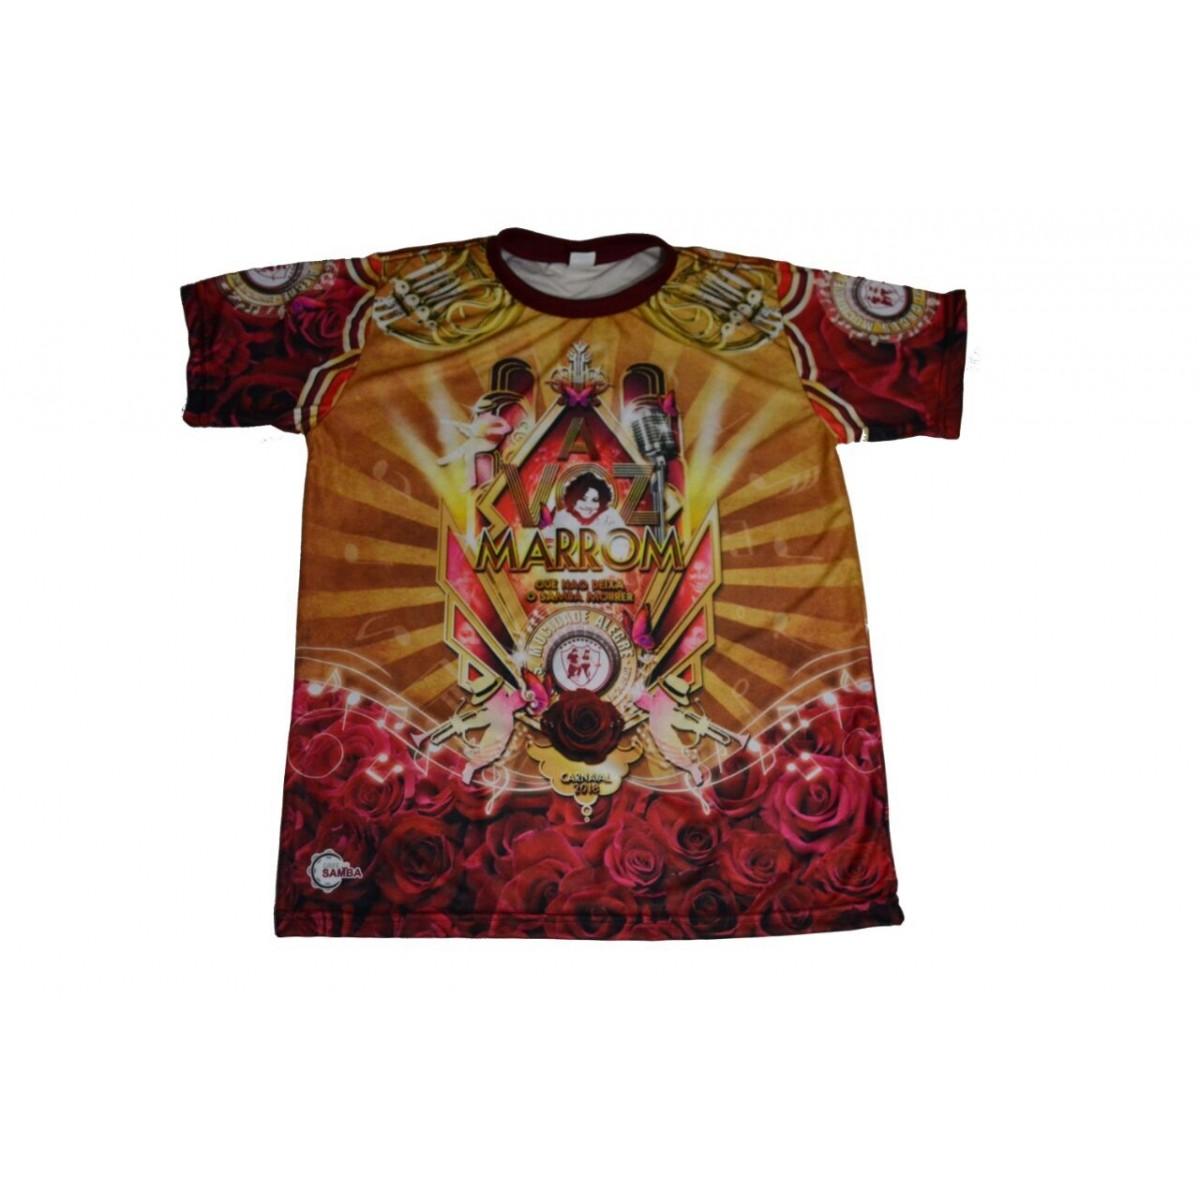 Camiseta Enredo 2018 - A Voz Marrom.....  - Mocidade Alegre